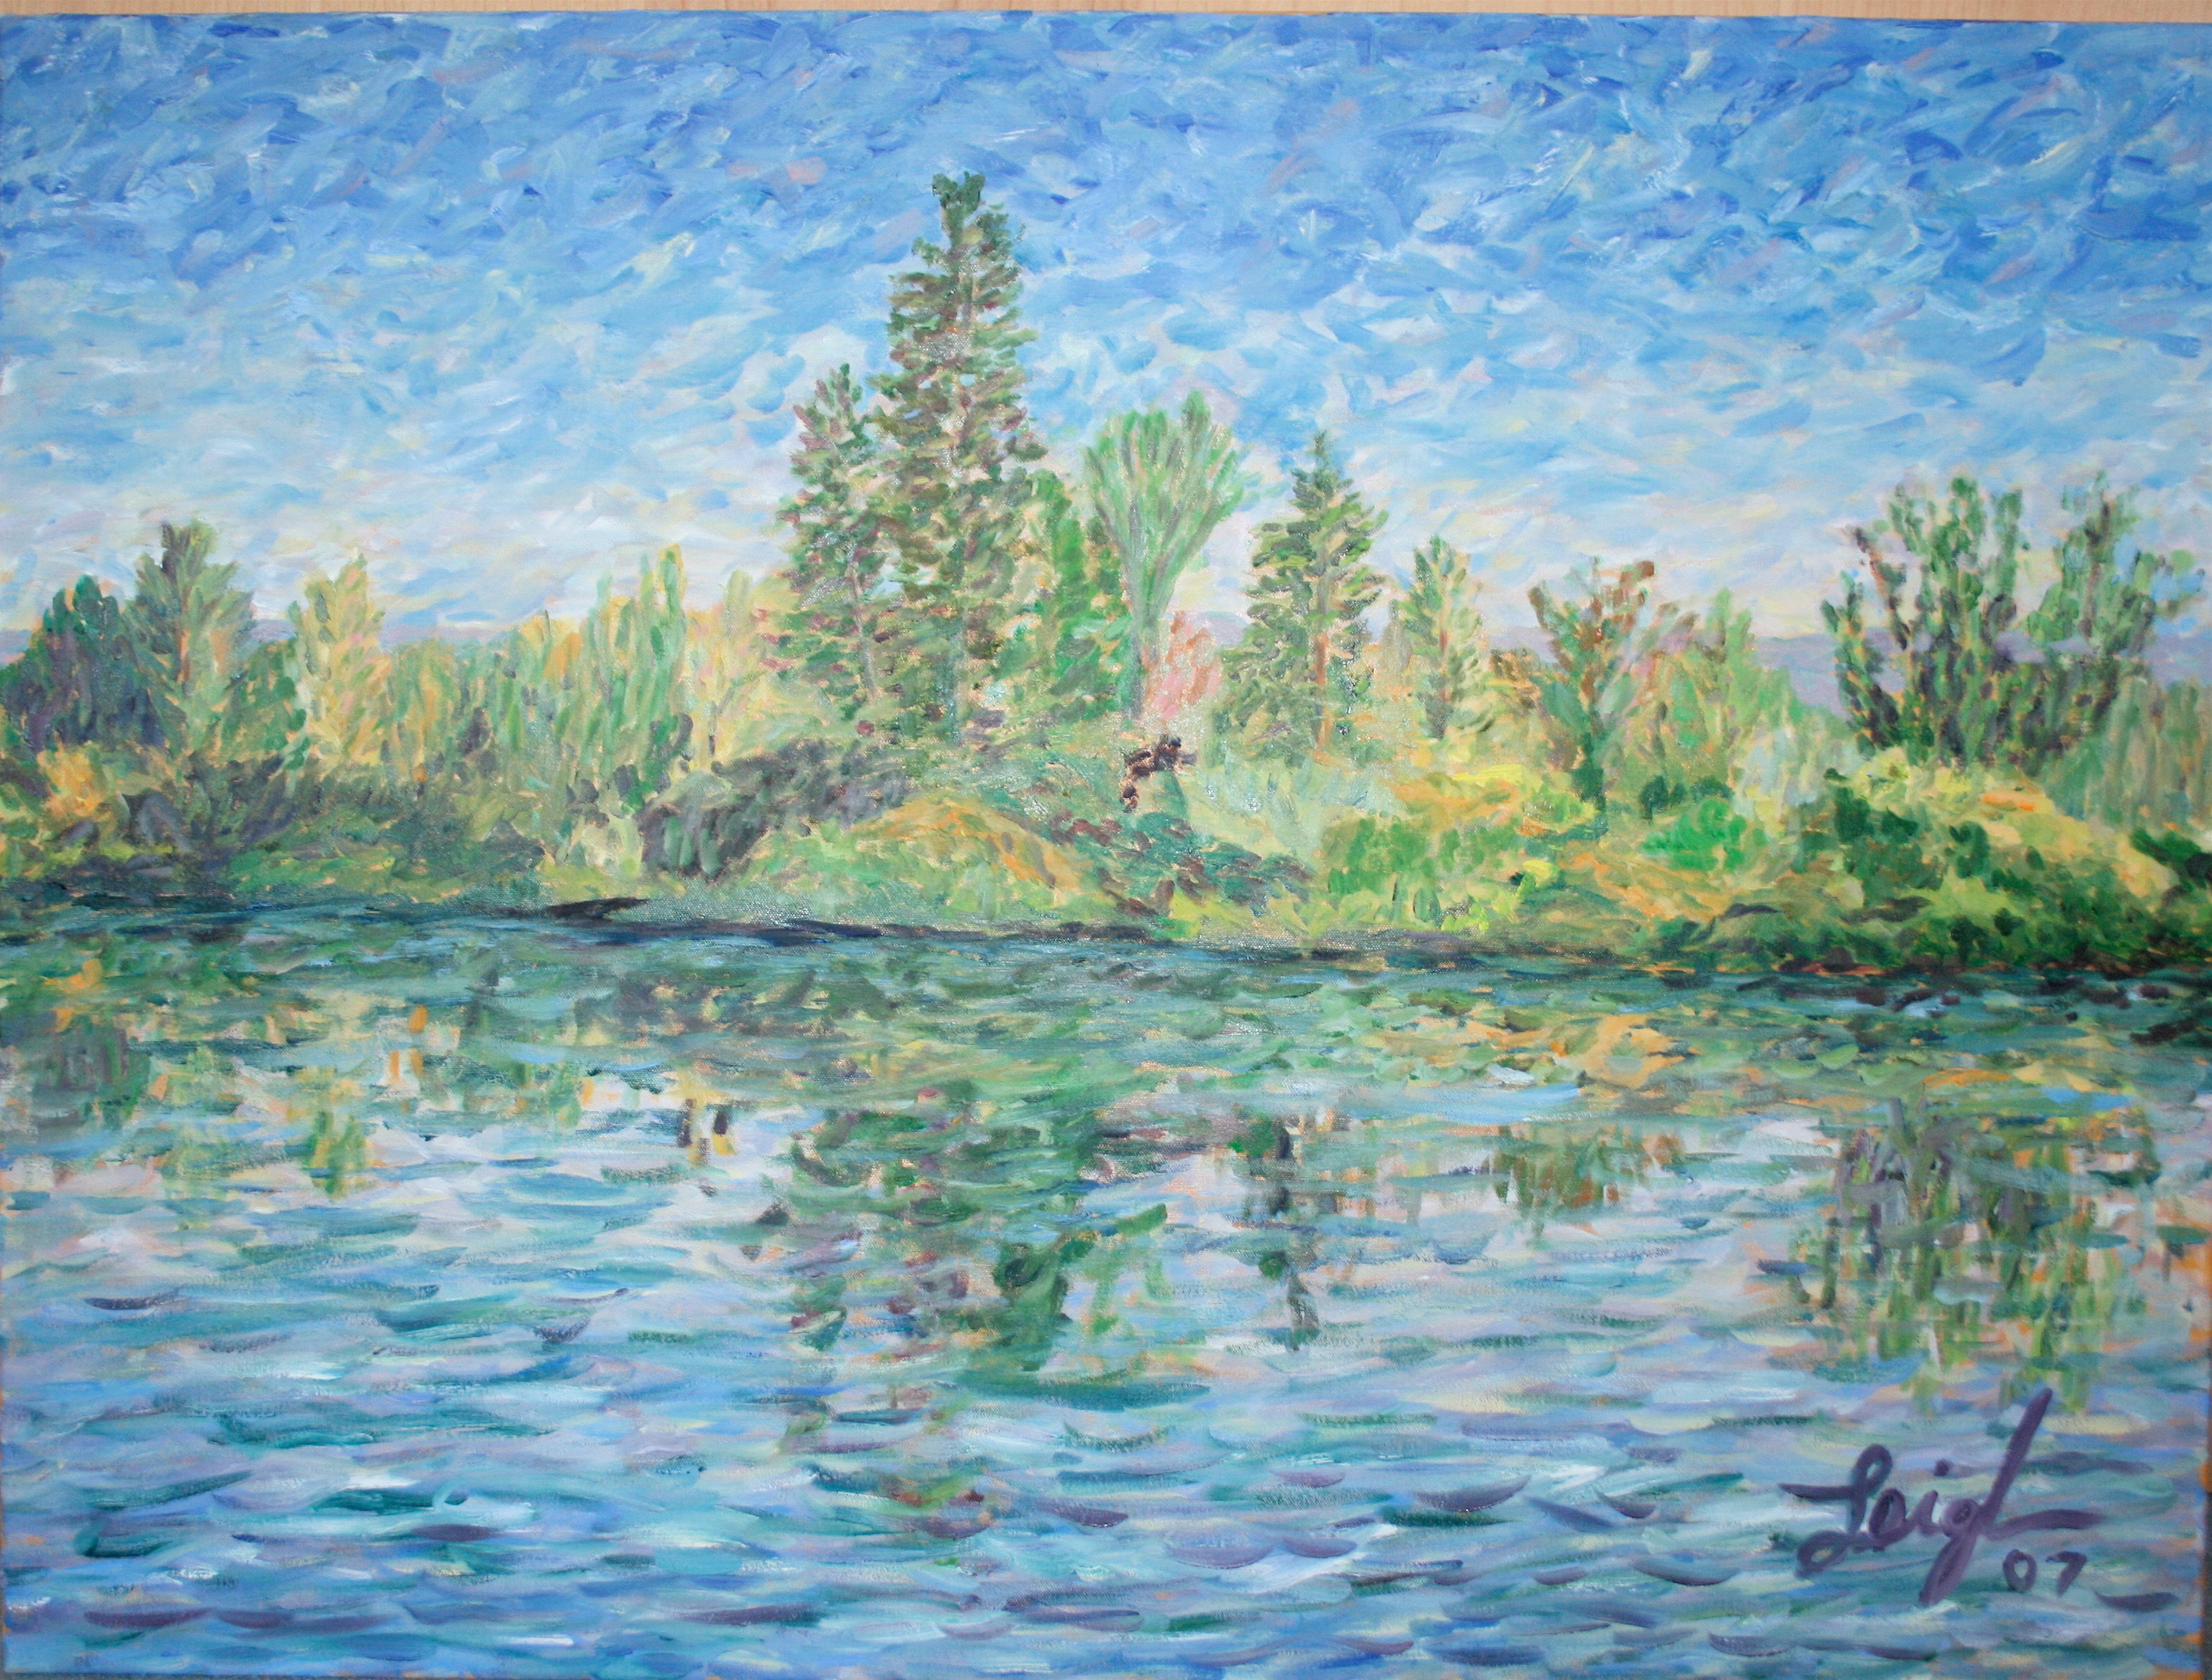 Swan River #2  ~   Laura Hill, Worthington, OH 2007  •  40 x 30